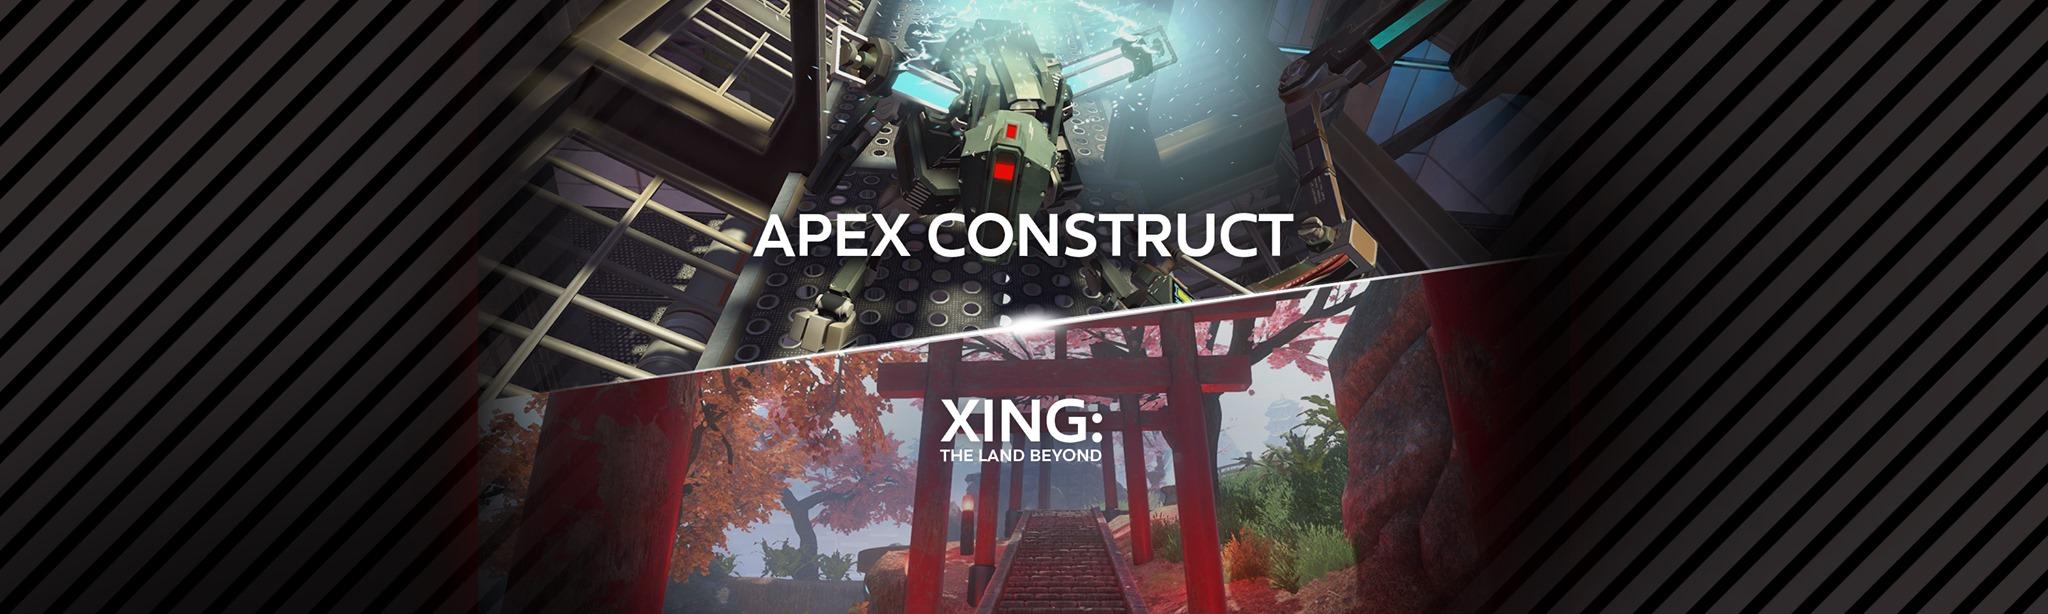 Apex Construct + XINGDuo Bundle £22.99 @ oculus